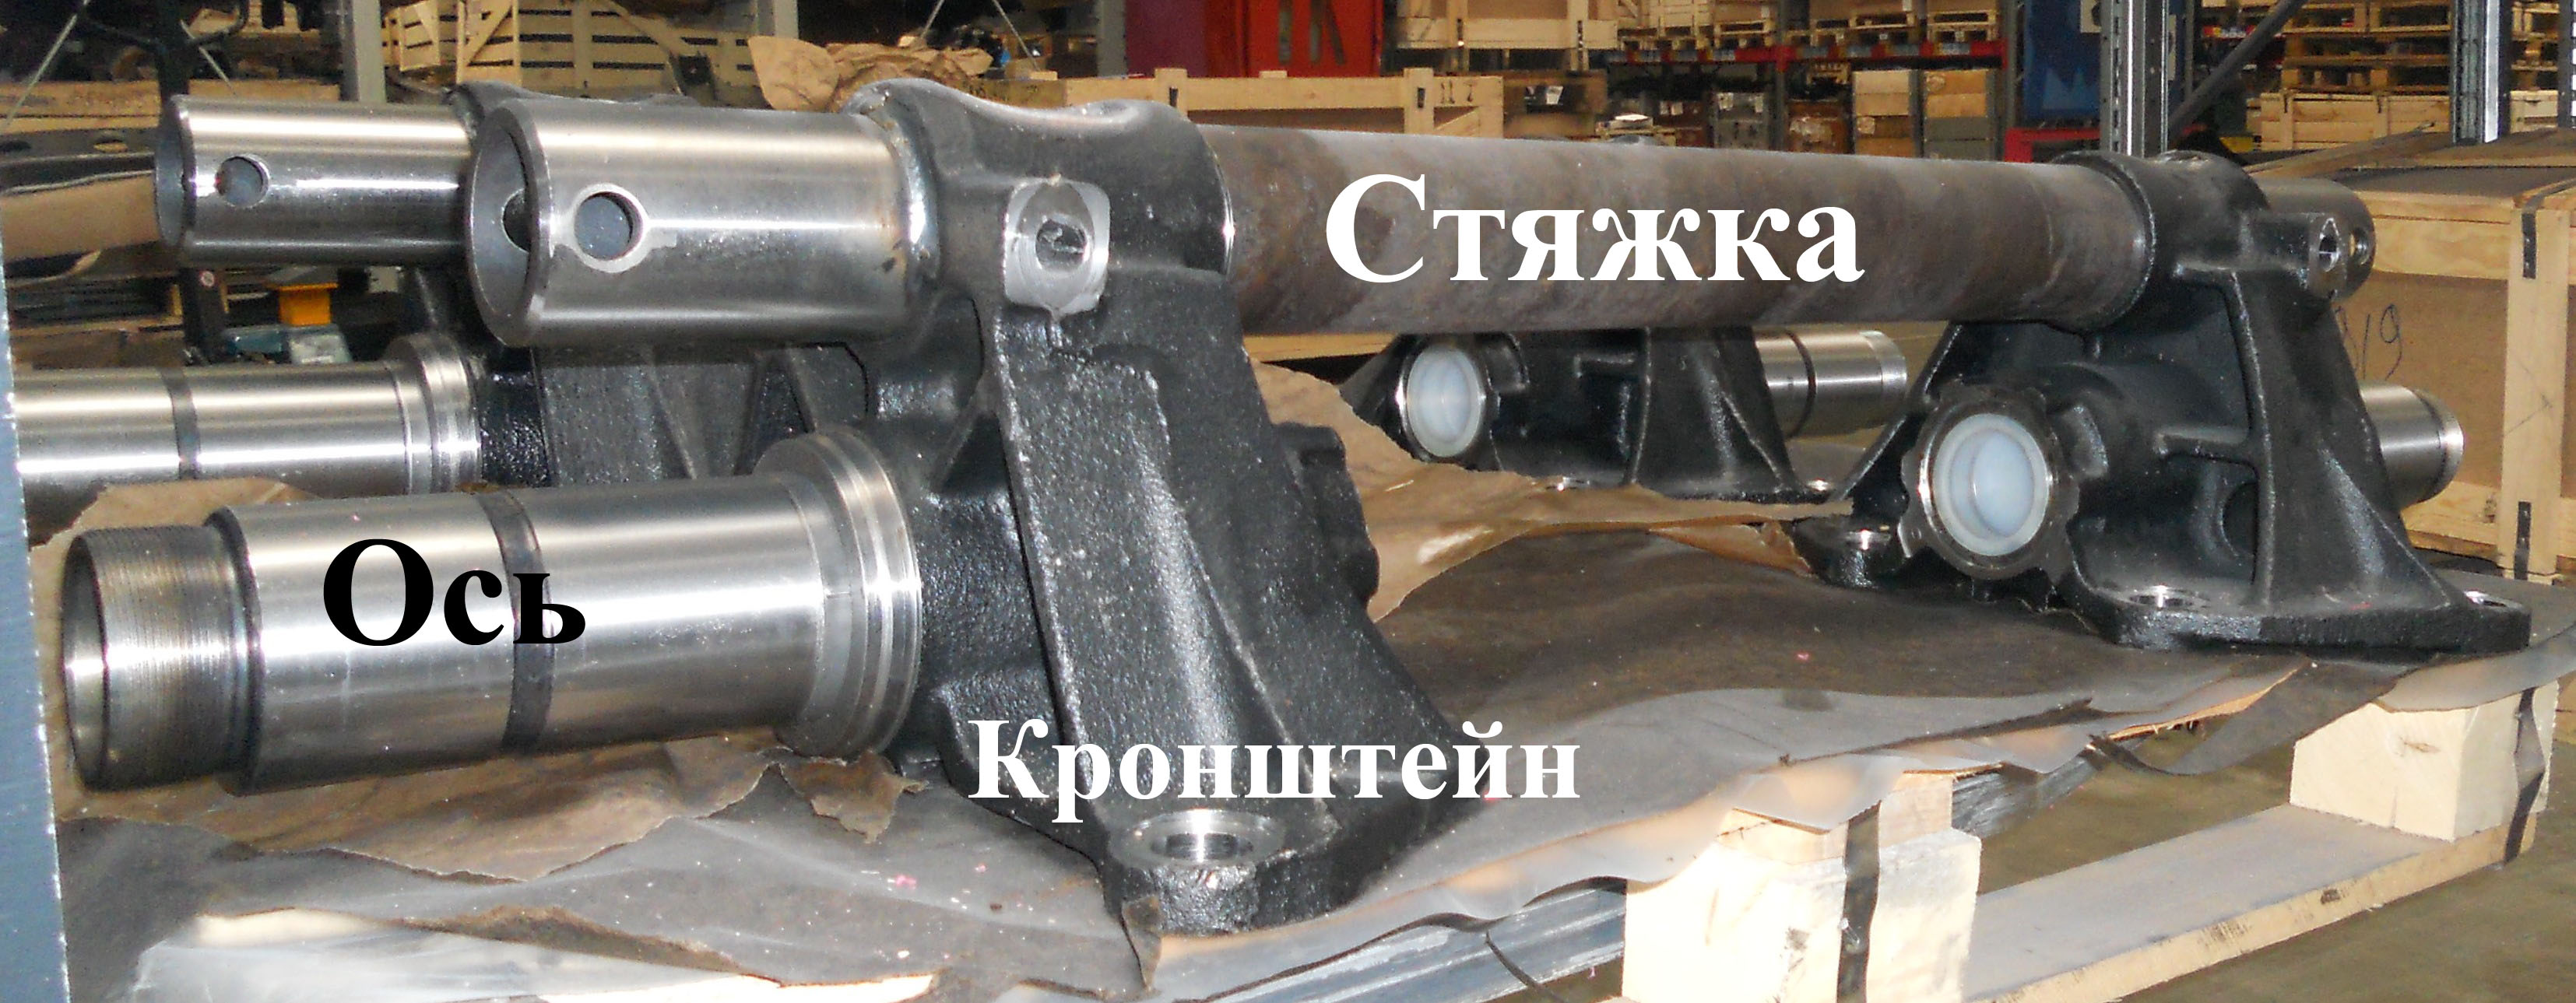 Кронштейн балансира камаз 55111